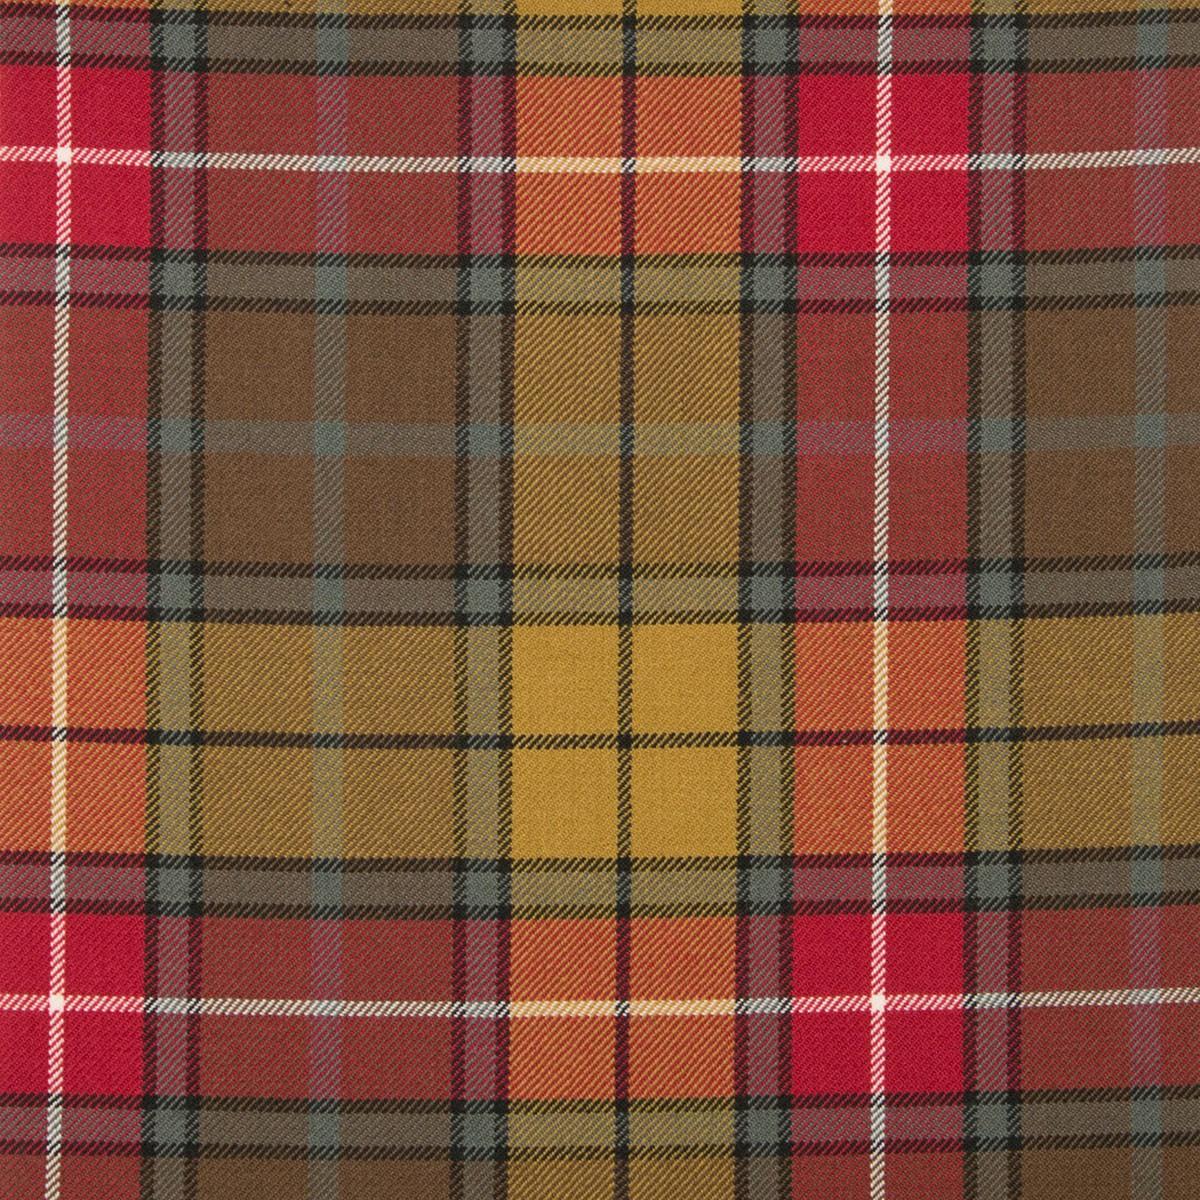 Buchanan Weathered Medium Weight Tartan Fabric-Front